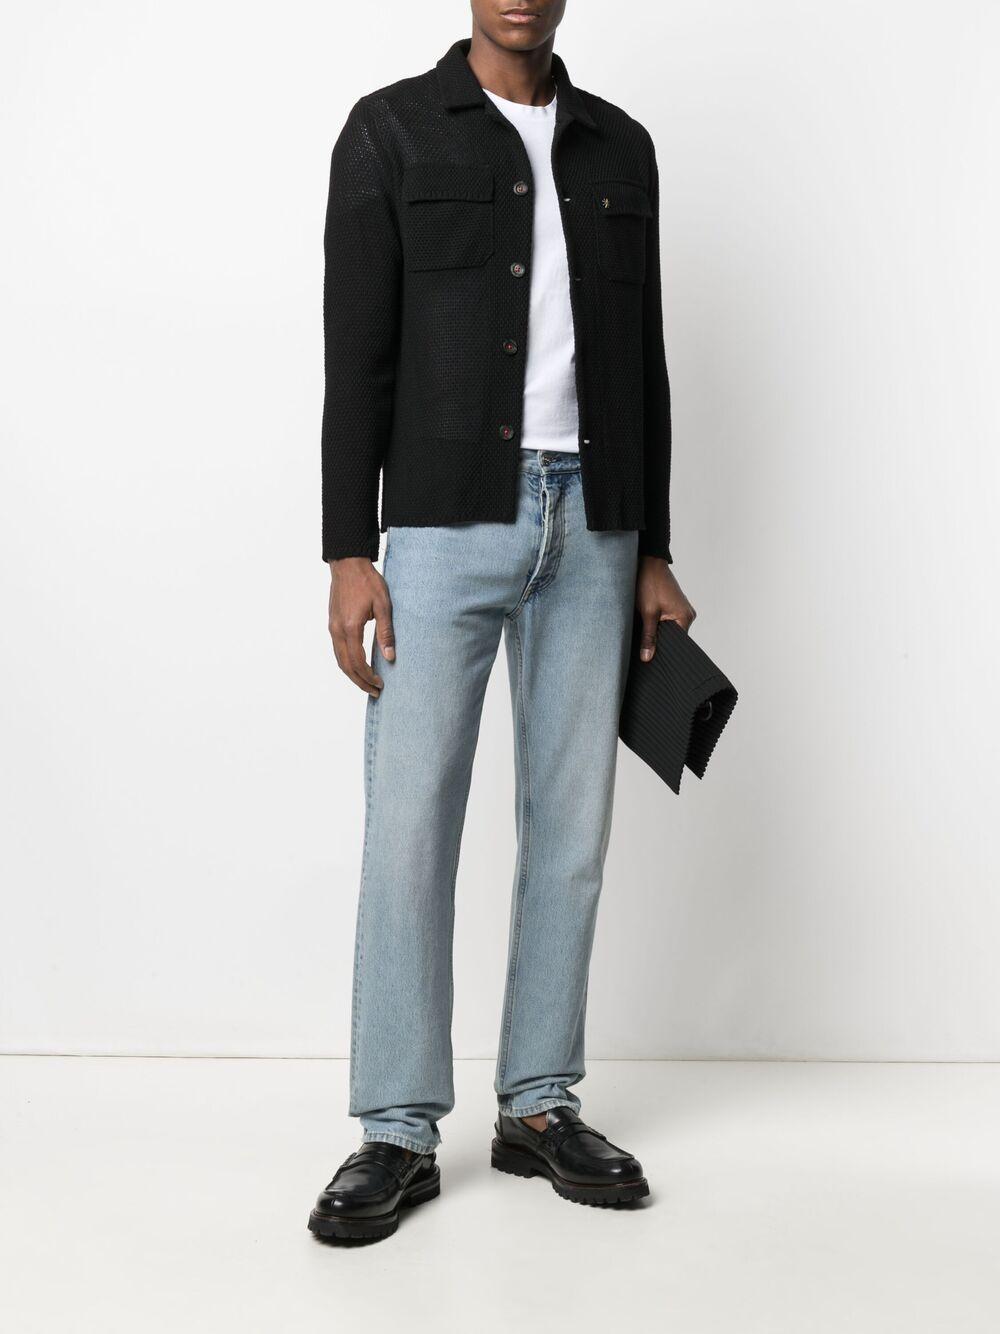 Black cotton fine-knit shirt featuring classic collar MANUEL RITZ |  | 3032M591-21330399